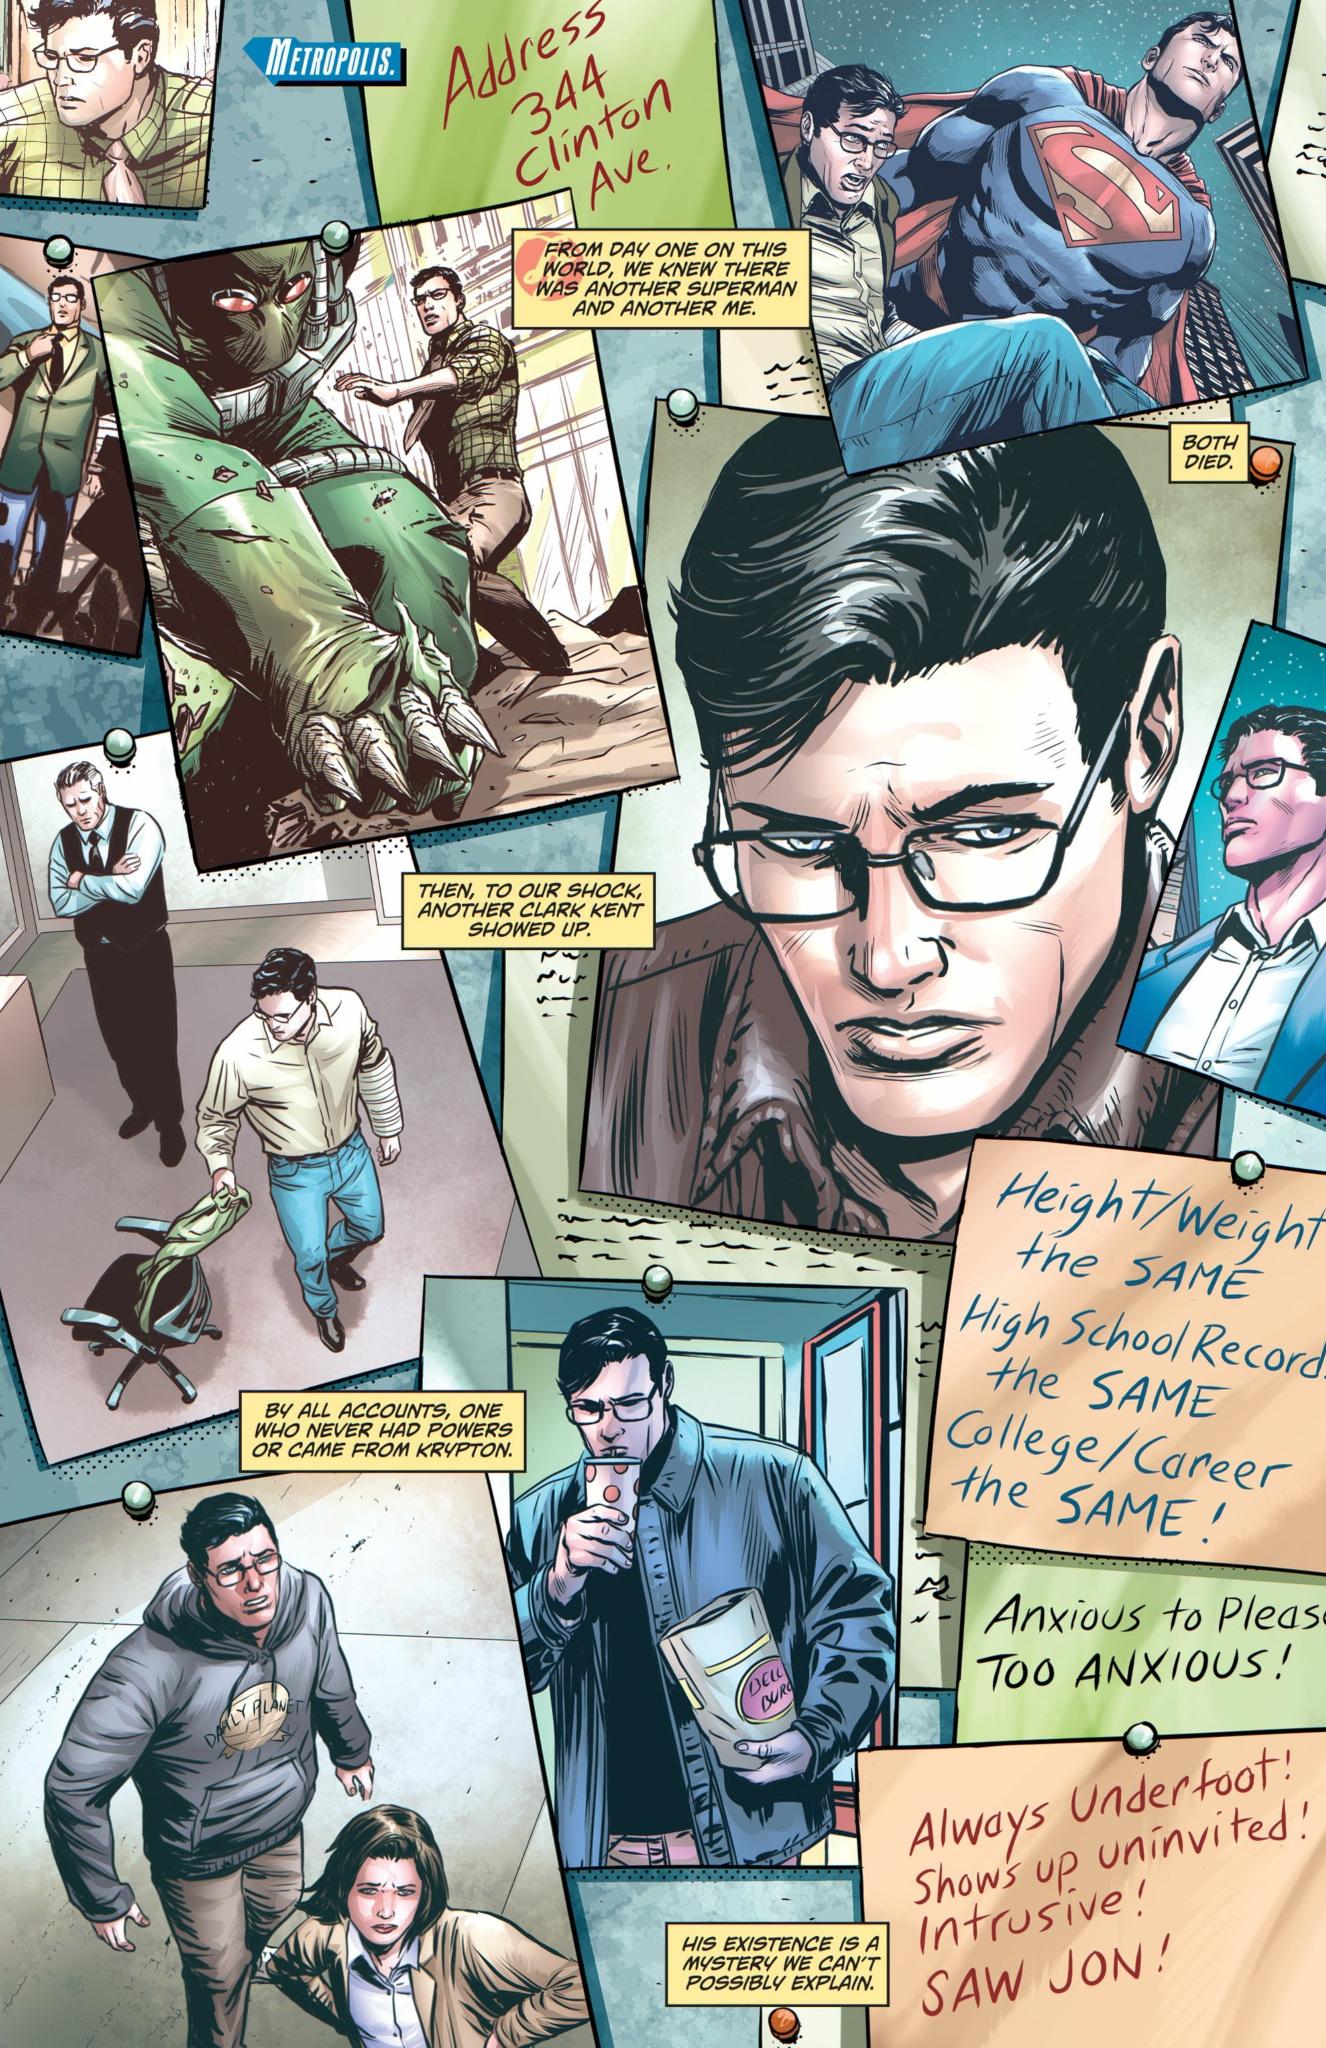 Action Comics  #974 (DC, April 2017)